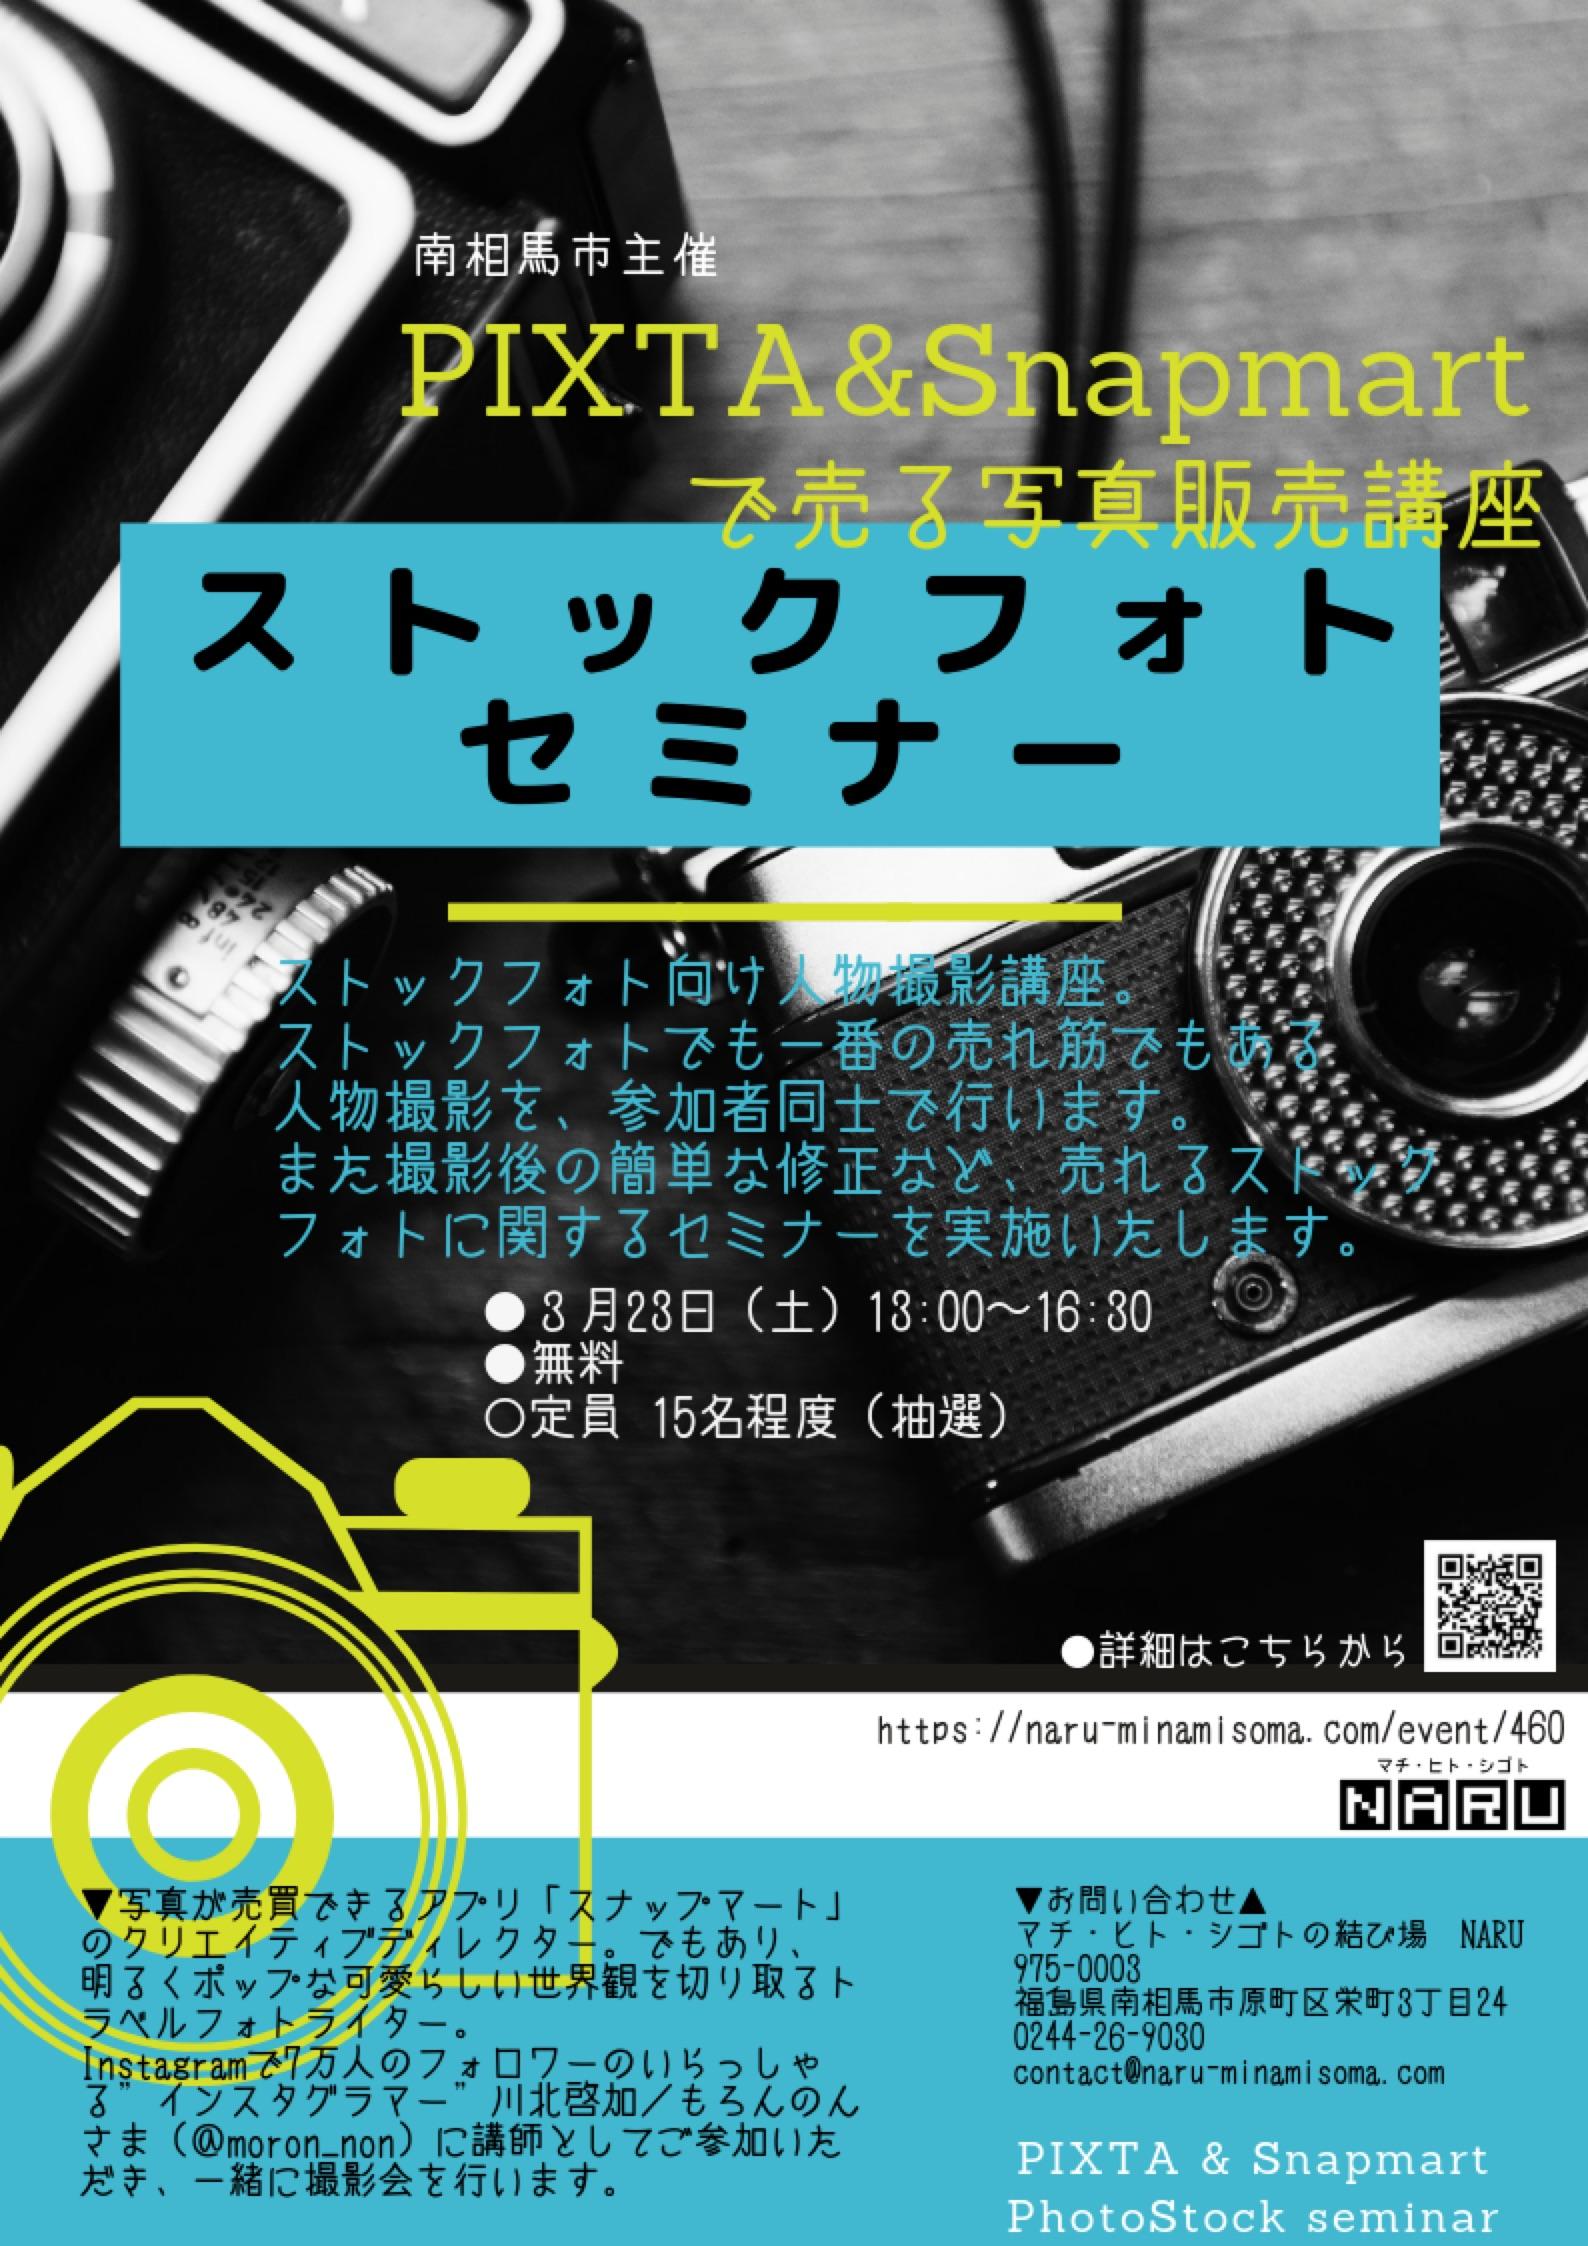 PIXTA&スナップマート ストックフォトセミナー